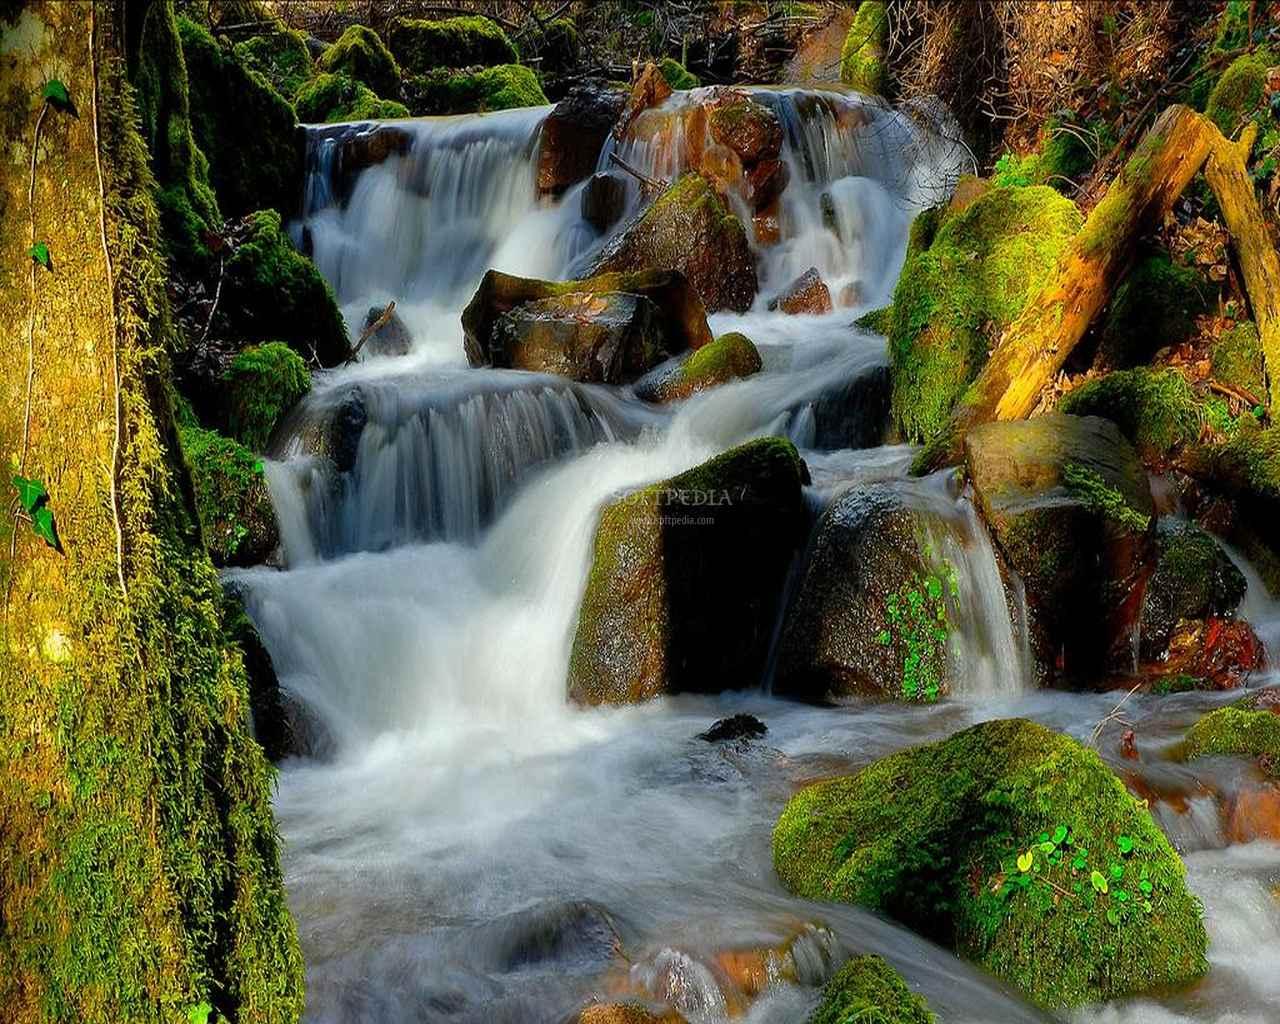 Freebking Waterfall Screensaver   Freebking Waterfall Screensaver 1280x1024